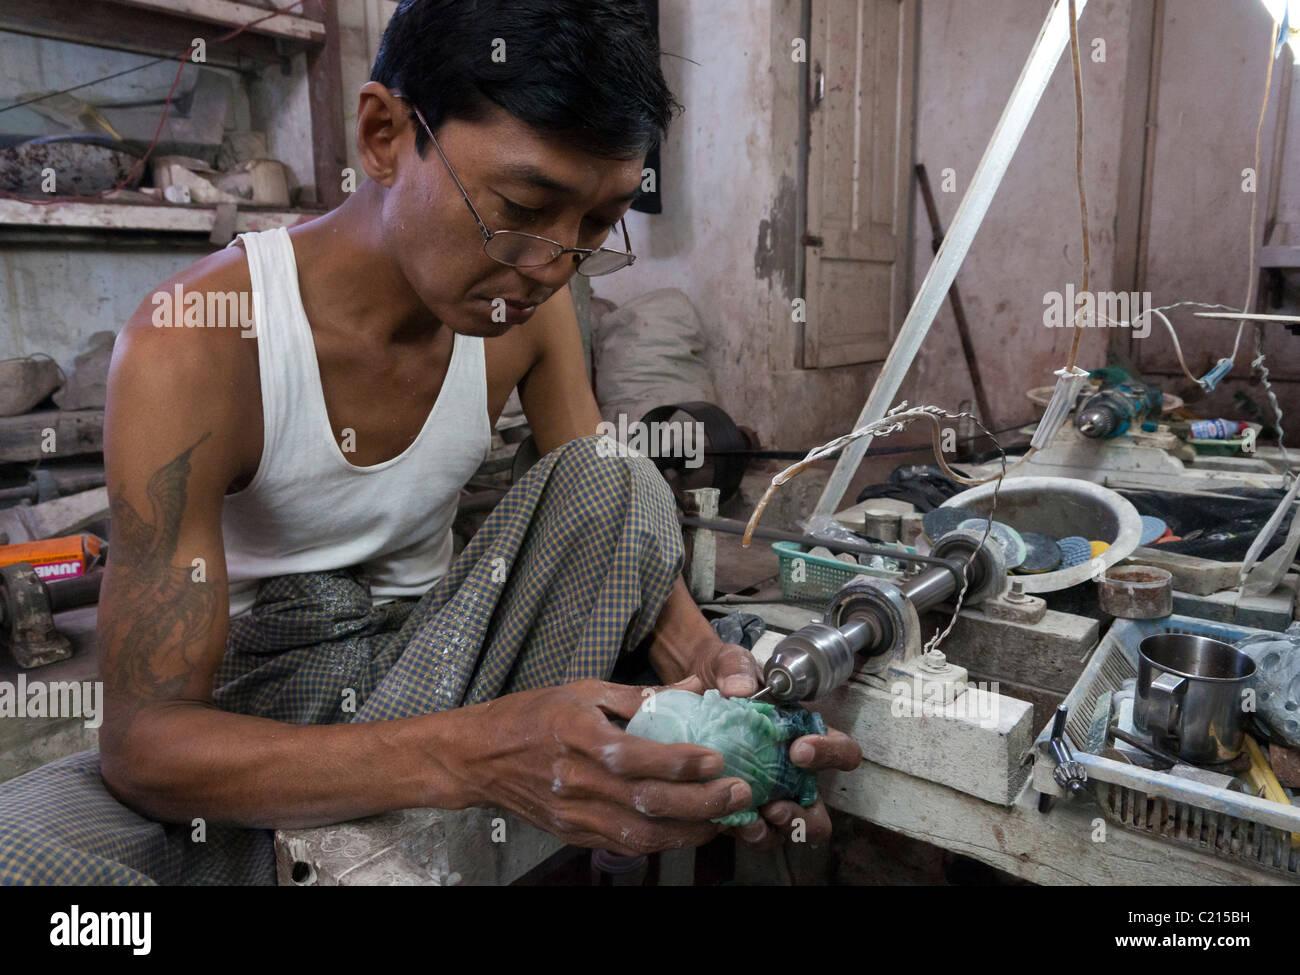 man carving a jade stone in workshop. Yangon. Myanmar - Stock Image